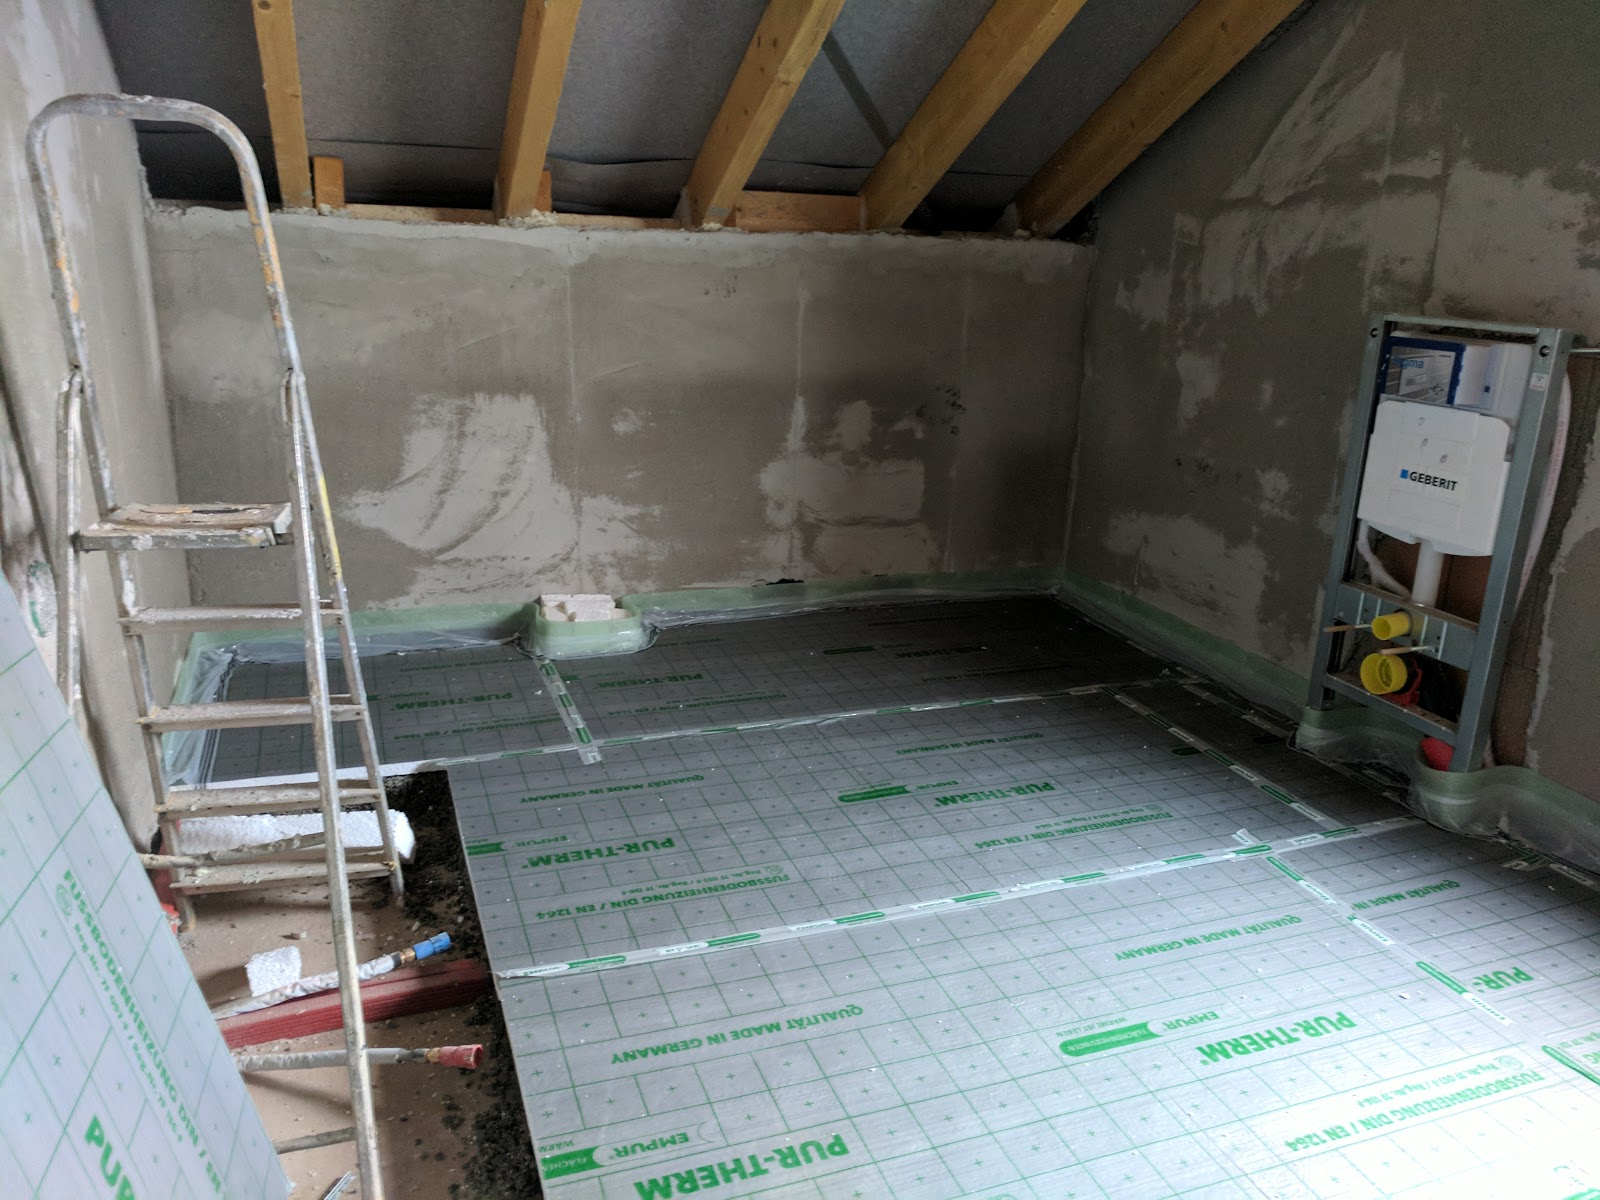 Fußboden Querschnitt ~ Estrich fußbodenheizung und anschlüsse hausbau mit czech bau gmbh